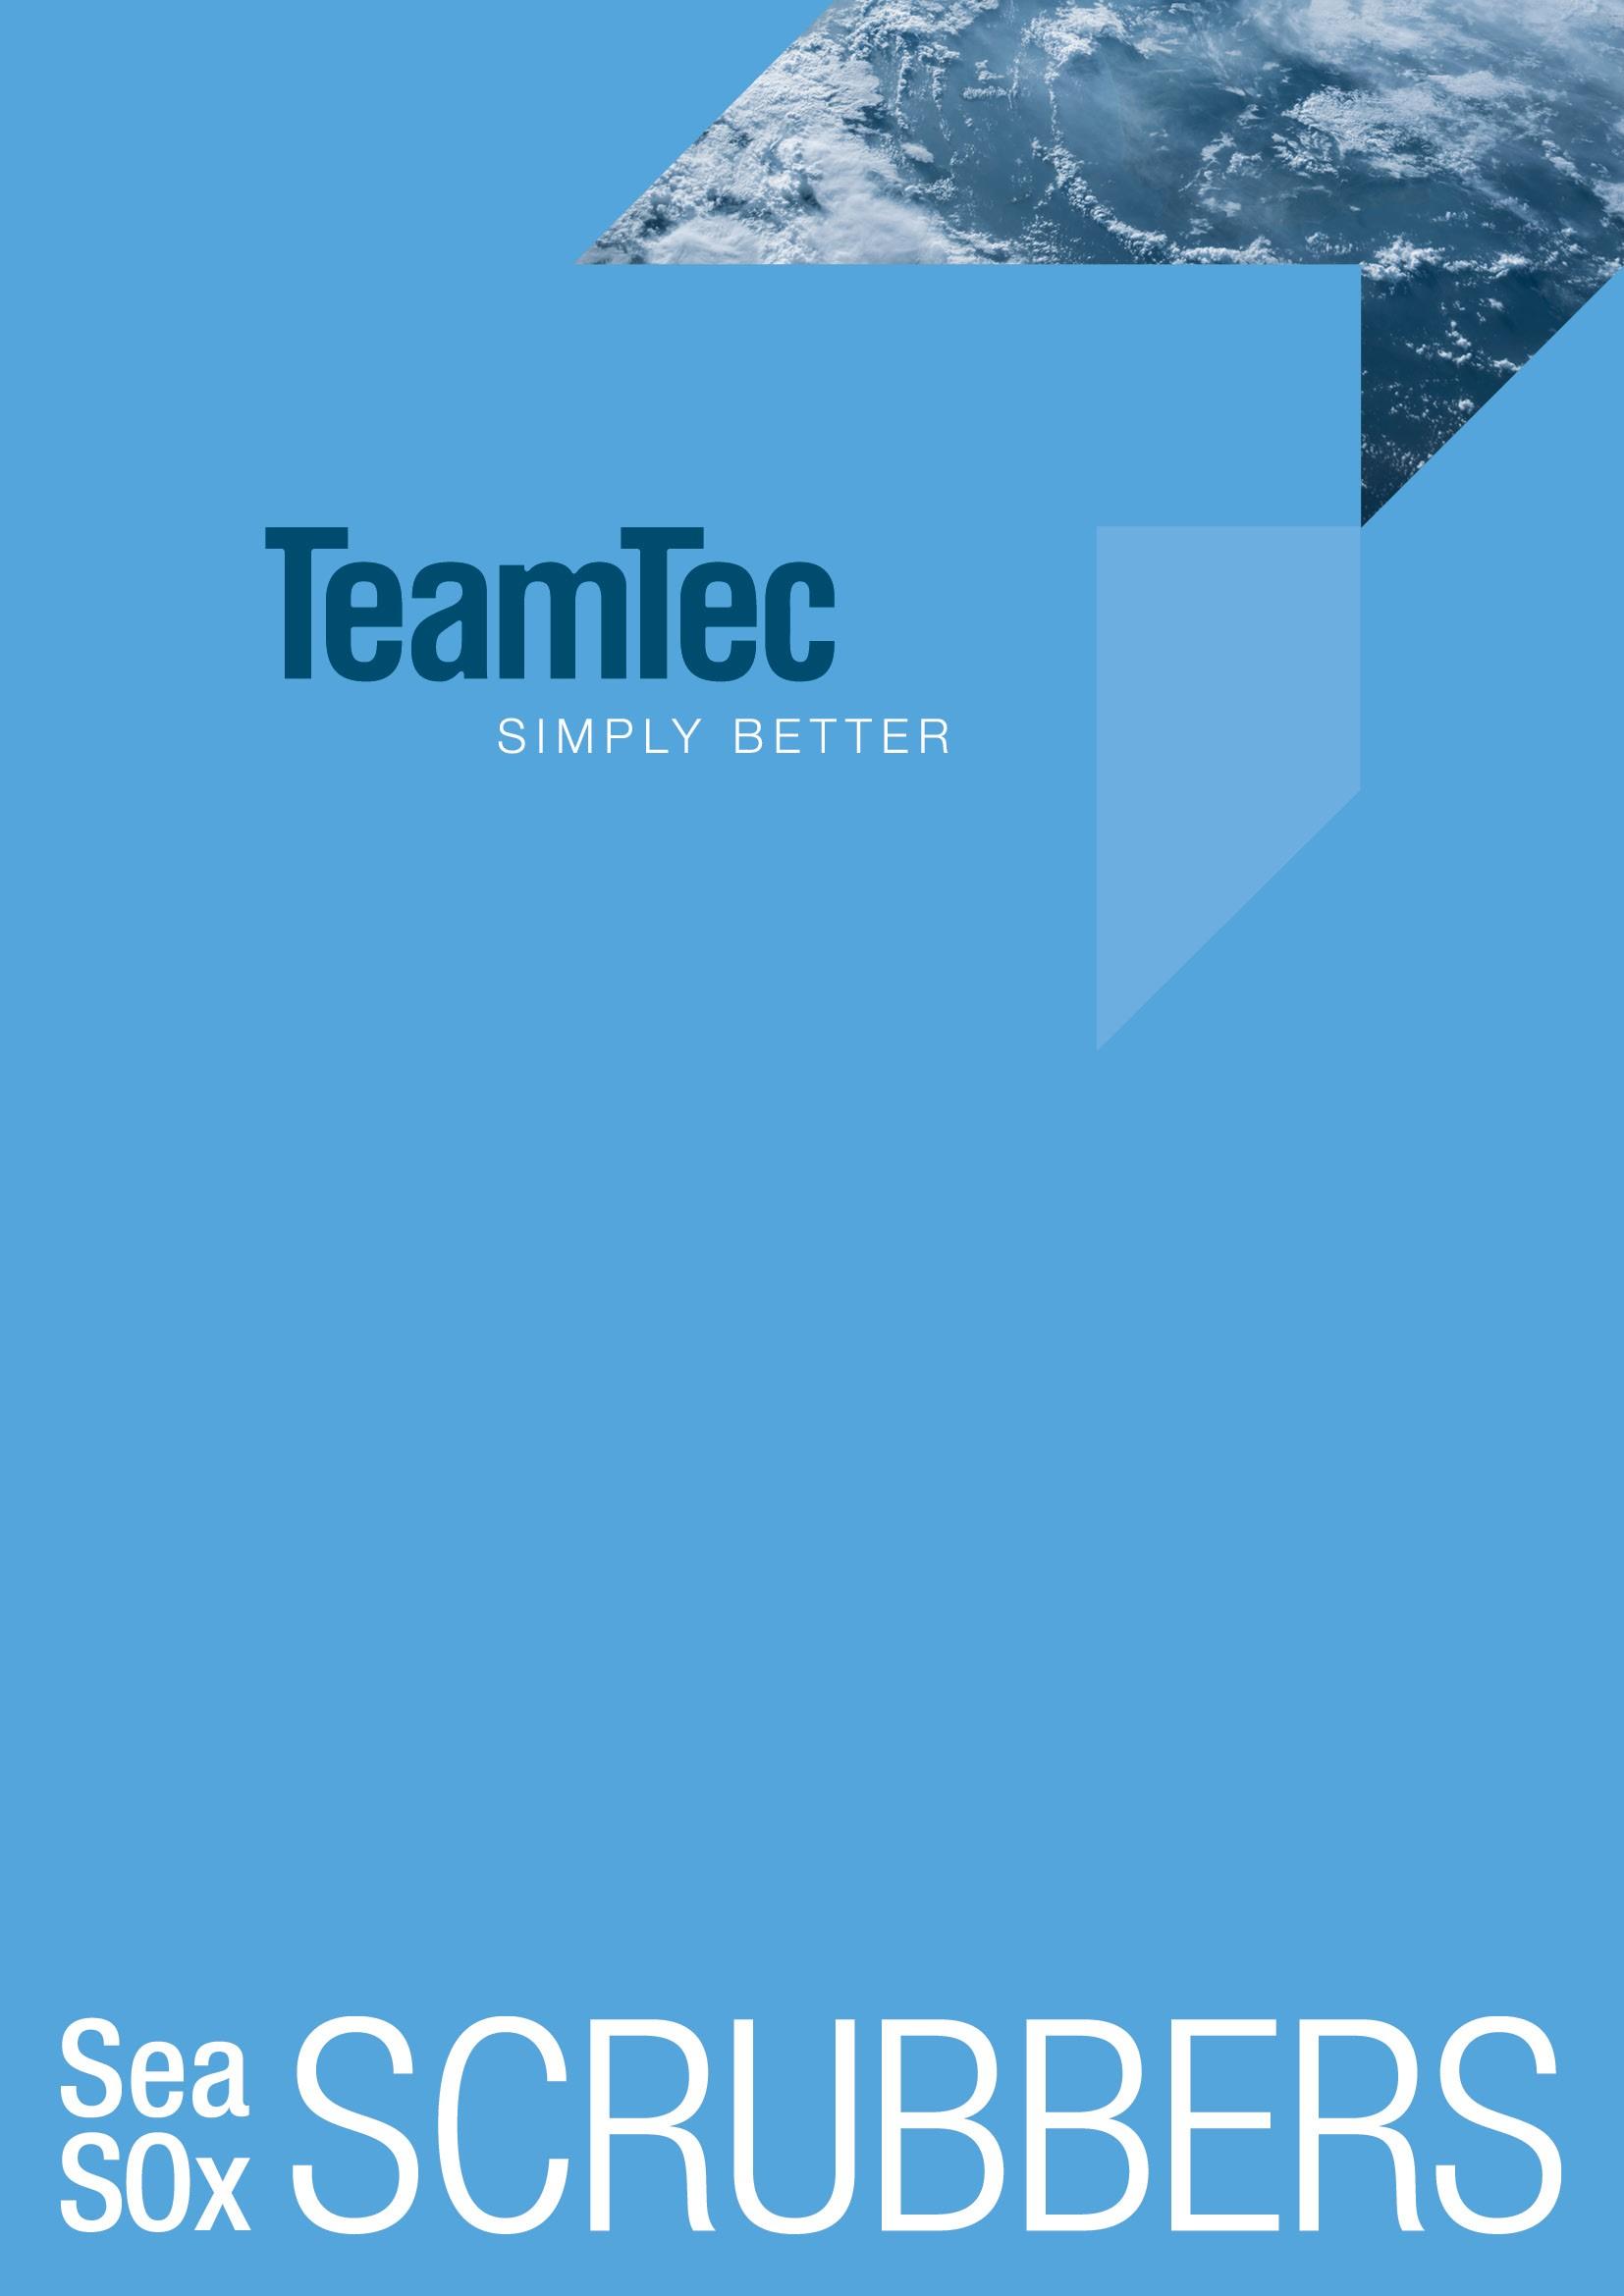 TeamTec Scrubbers